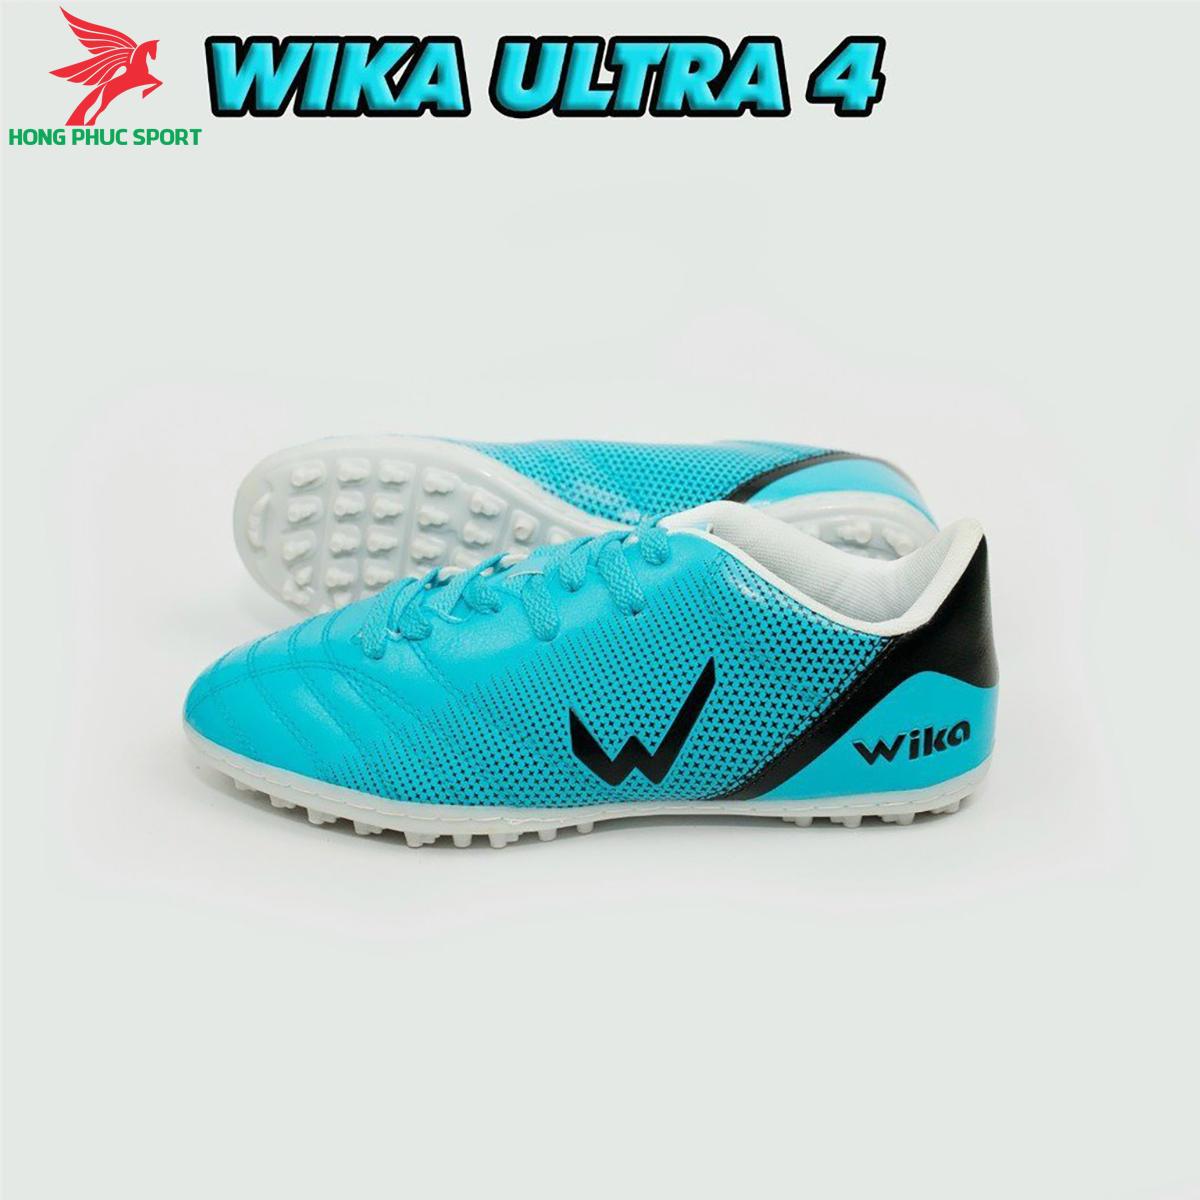 https://cdn.hongphucsport.com/unsafe/s4.shopbay.vn/files/285/giay-da-bong-wika-ultra-4-xanh-ngoc-san-co-nhan-tao-1-603d9875499bb.png